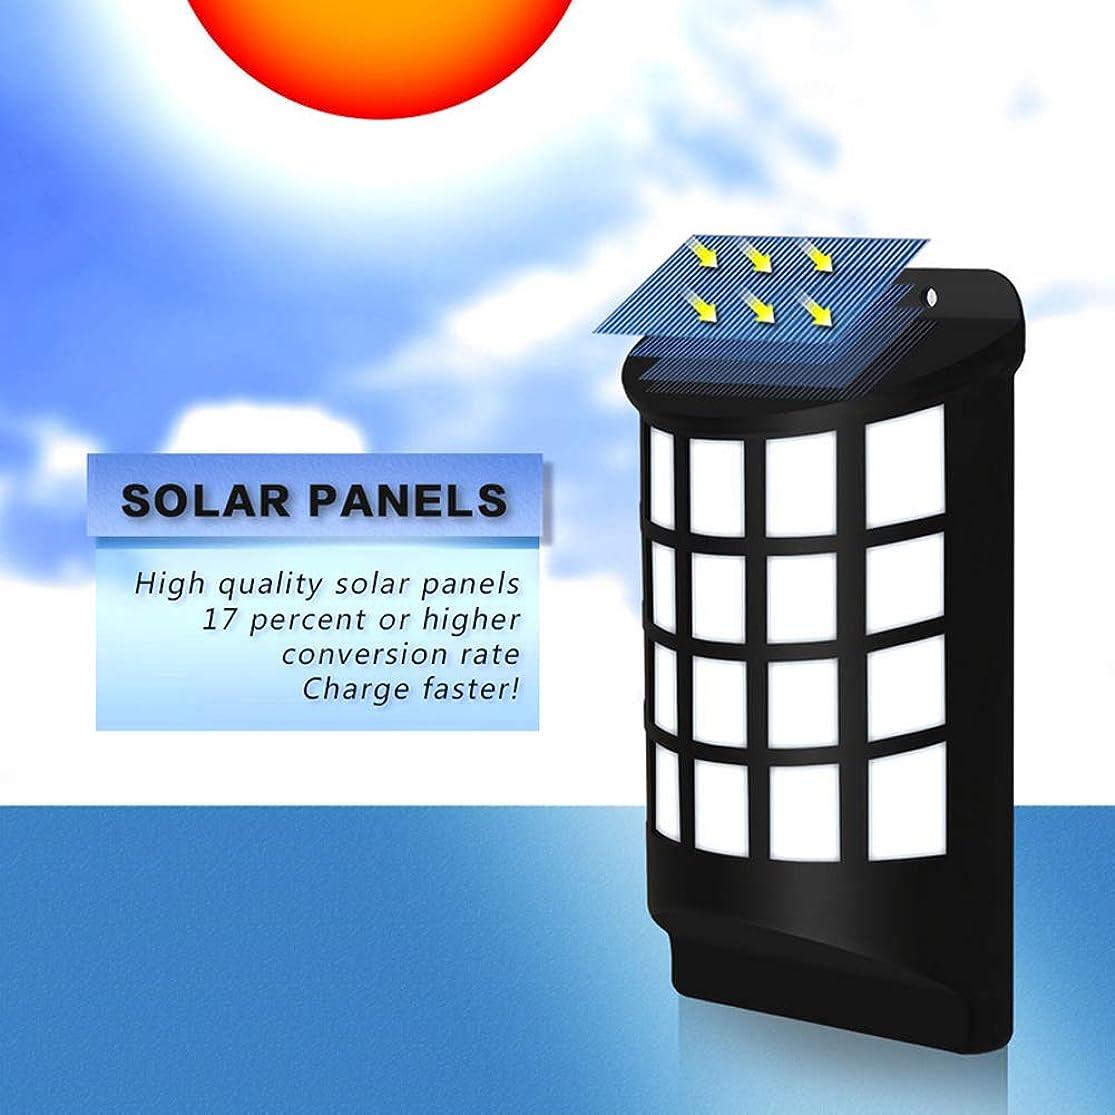 Wall Lights, Wall Lamps, yanQxIzbiu Motion Sensor 66LED Solar Powered Flickering Flame Wall Lamp Garden Yard Decor - Black kzwdznbx3